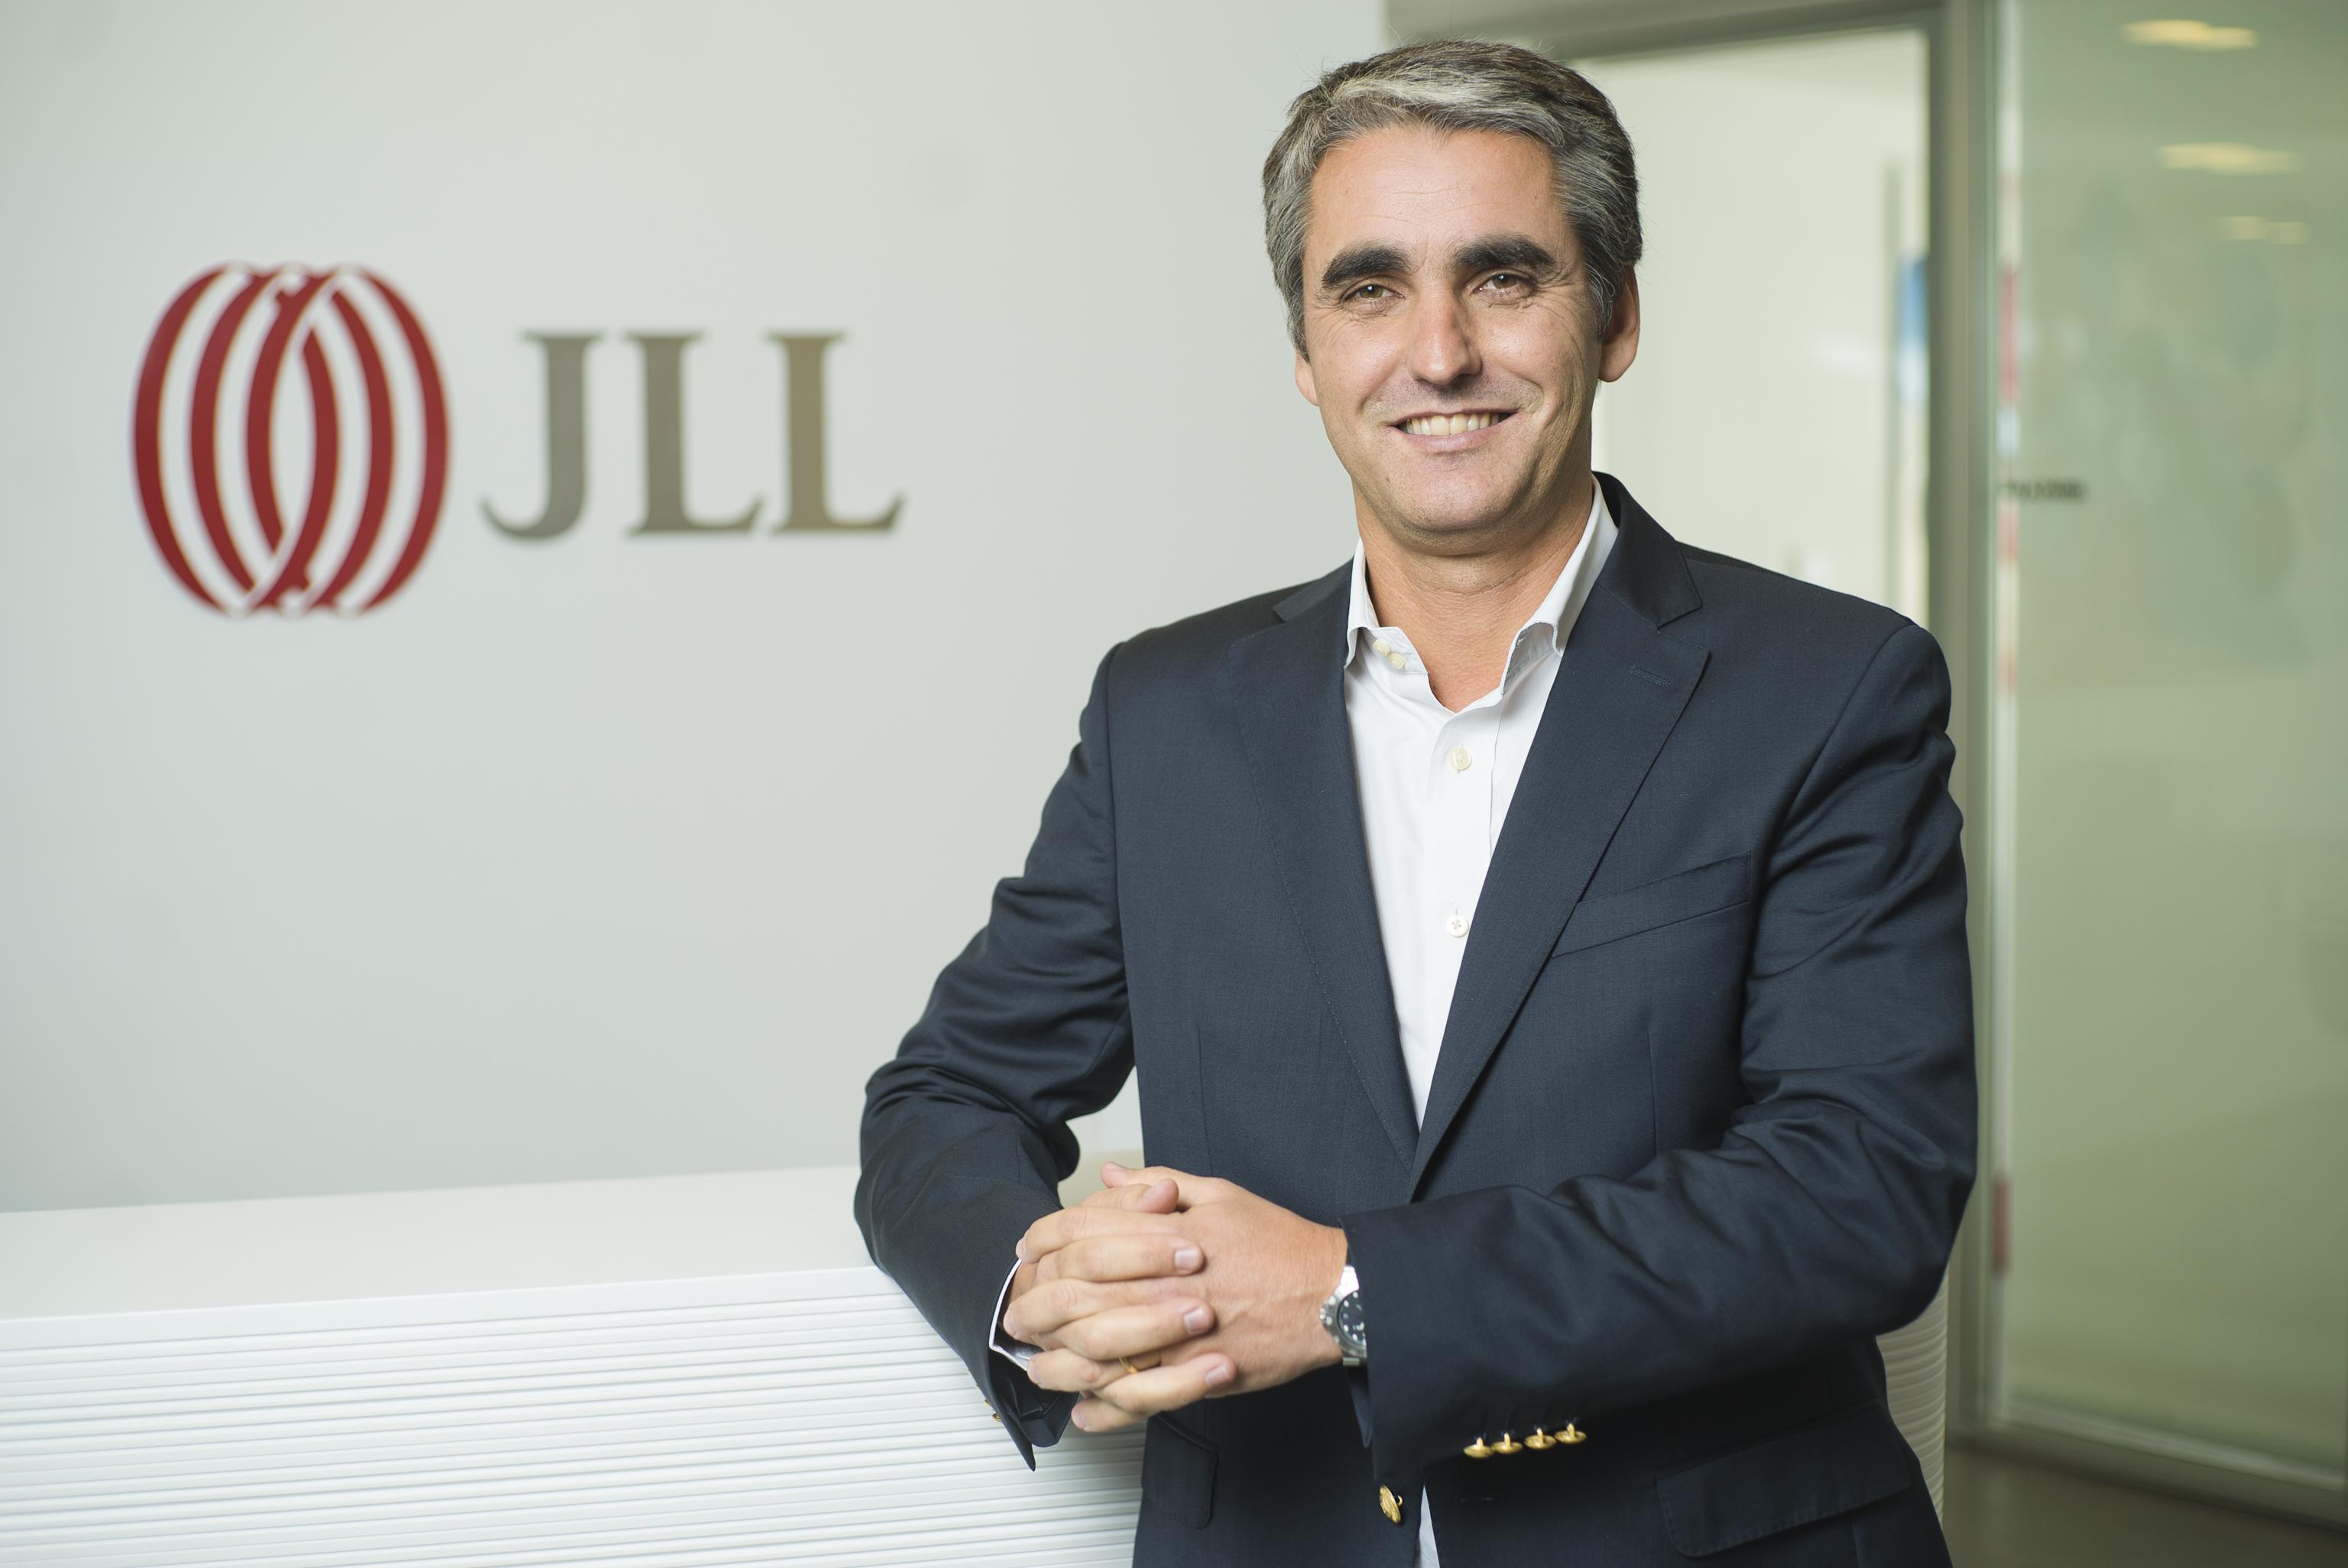 Pedro Lancastre, diretor da JLL Portugal / JLL